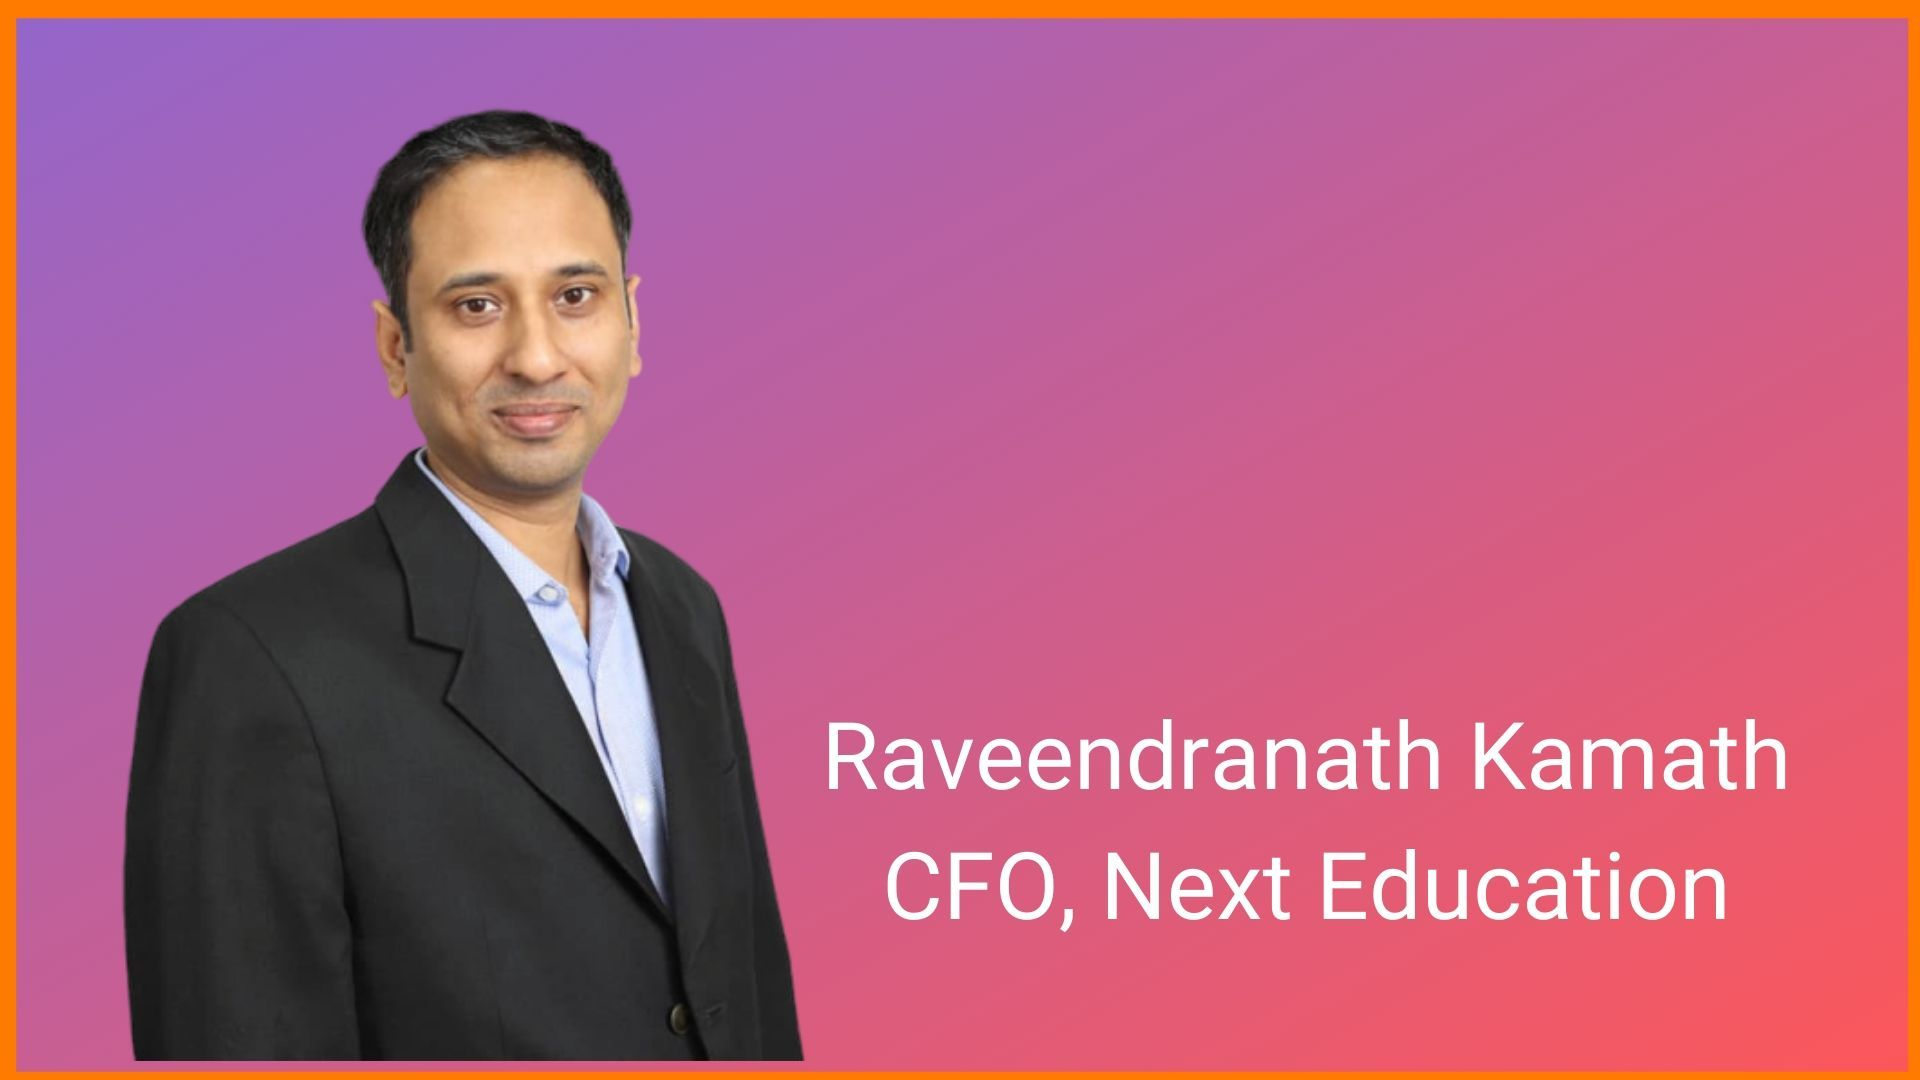 Raveendranath Kamath, the Chief Financial Officer (CFO) of Next Education.